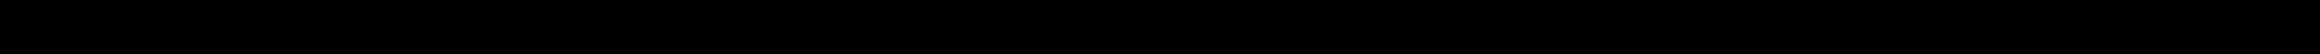 MANN-FILTER 6Q0 201 051, 6Q0 201 051 B, 6Q0 201 051 H, 6Q0 201 512 Palivovy filtr